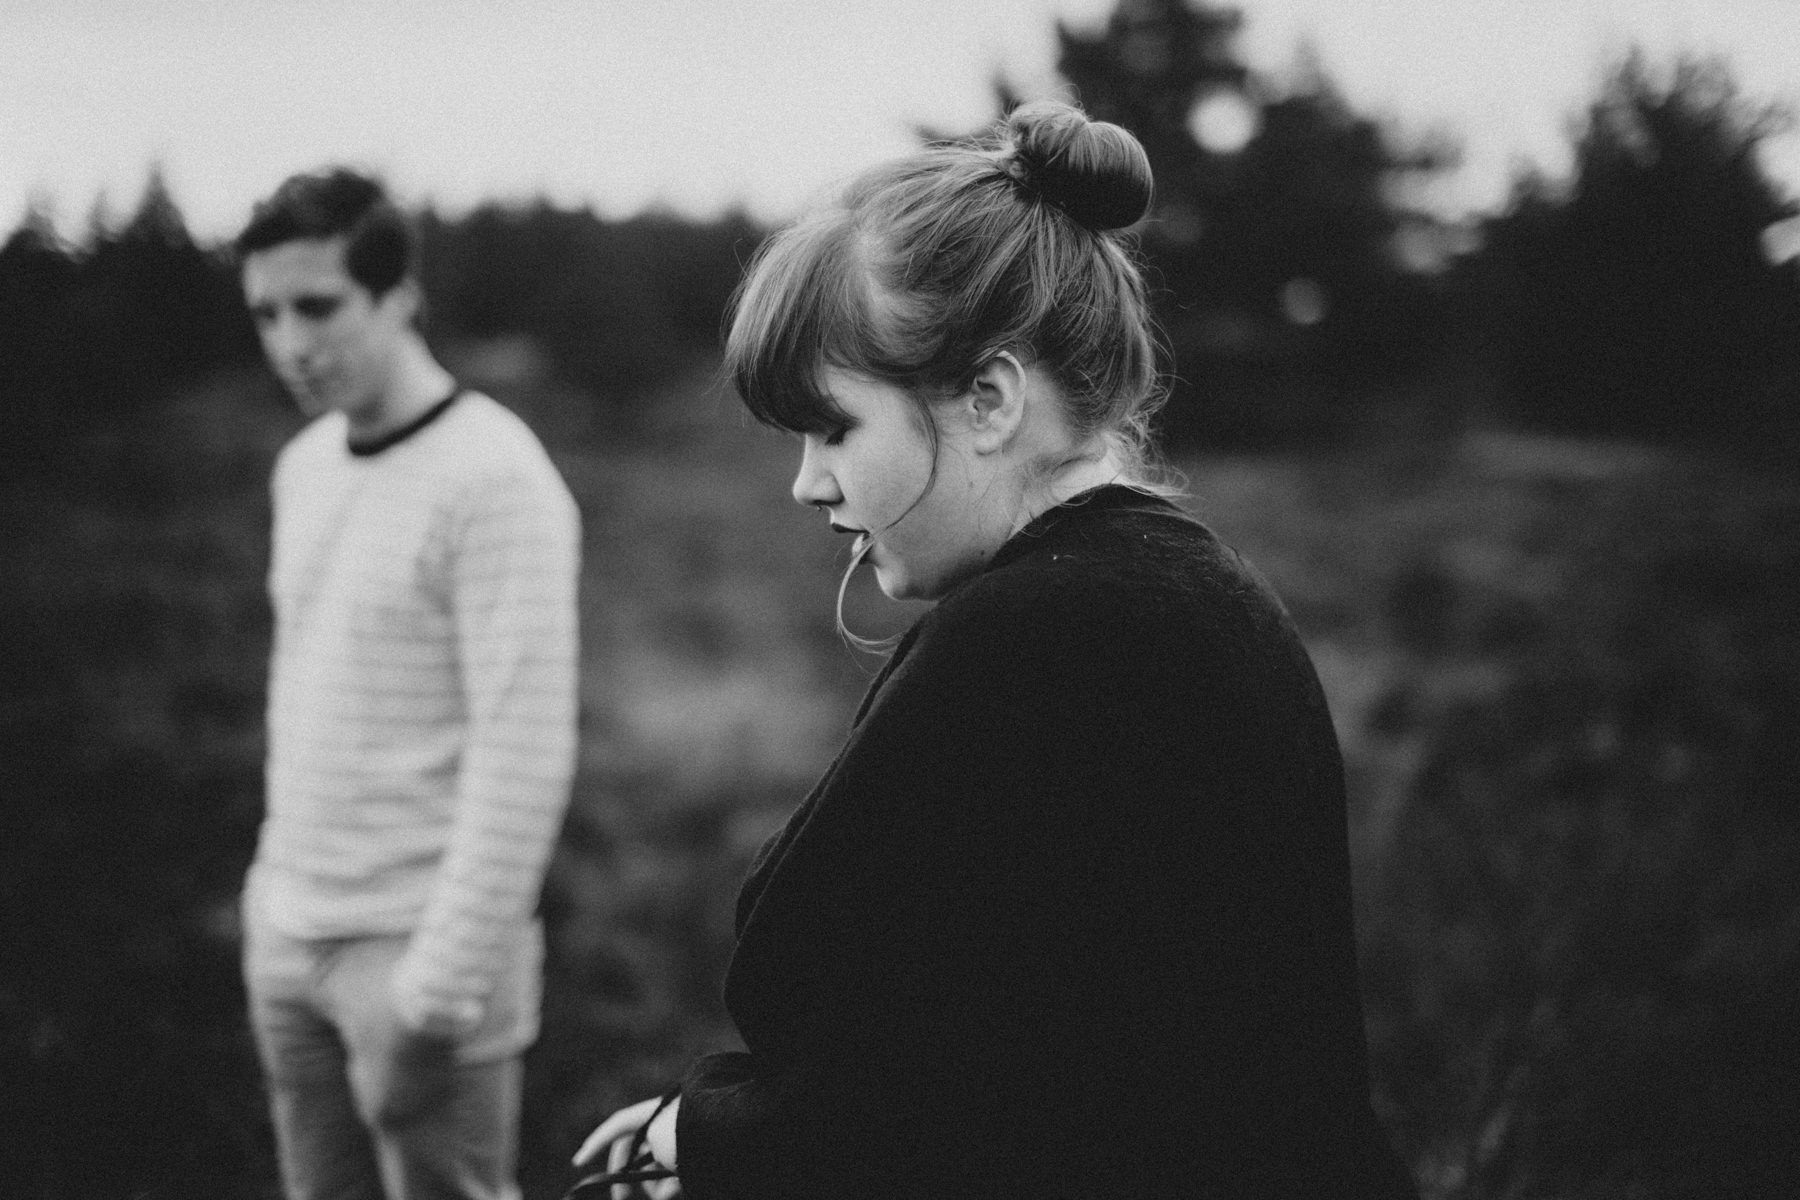 rebecca-andi-couple-paar-shooting-romo-daenemark-nordsee-fotografie-0001